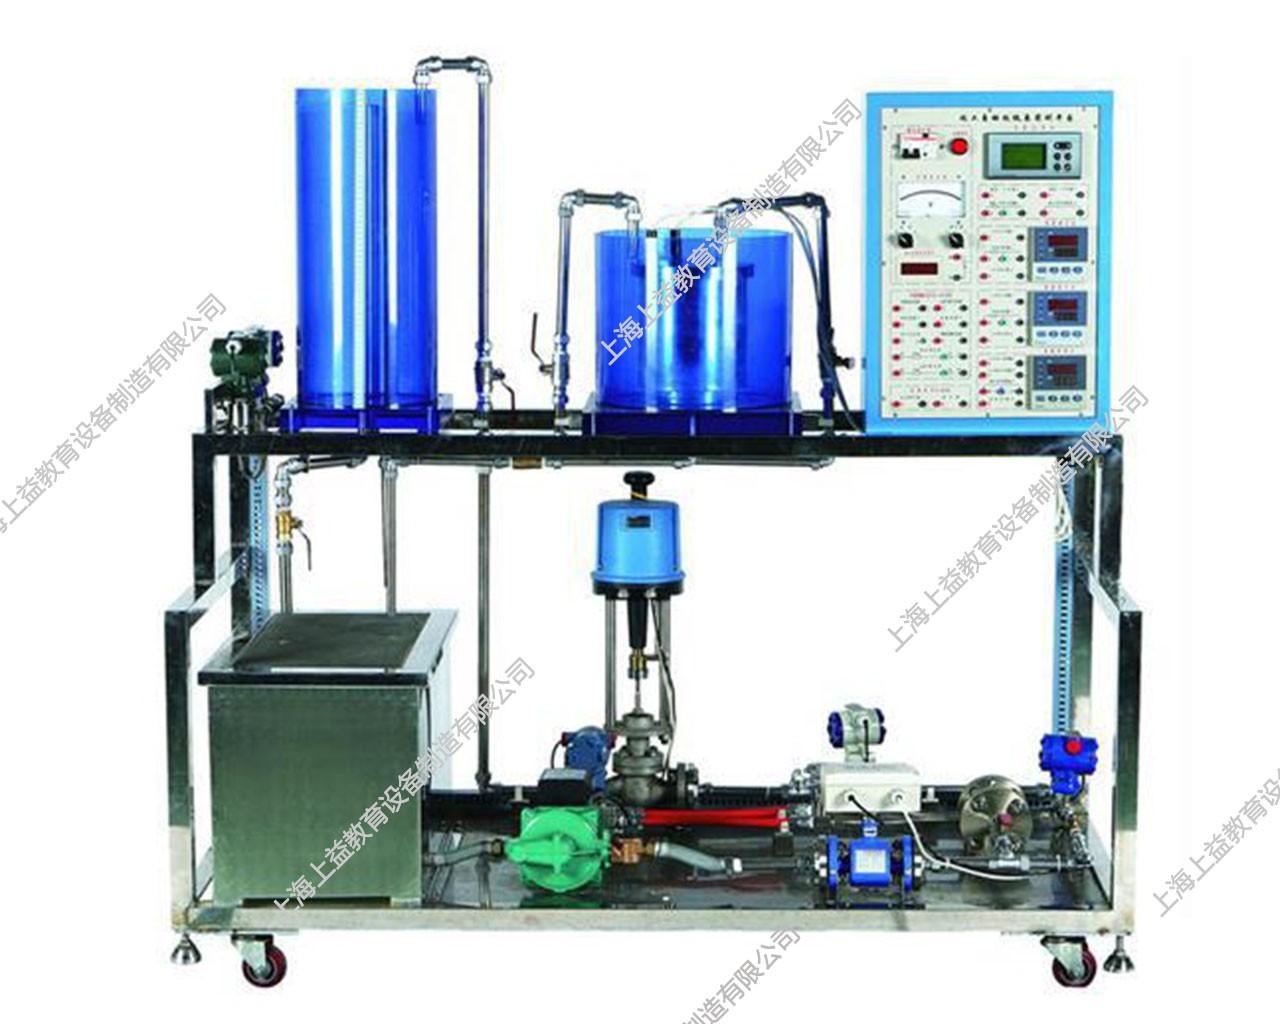 SYGK-12型热工自动化仪表wwwlehu8vip平台